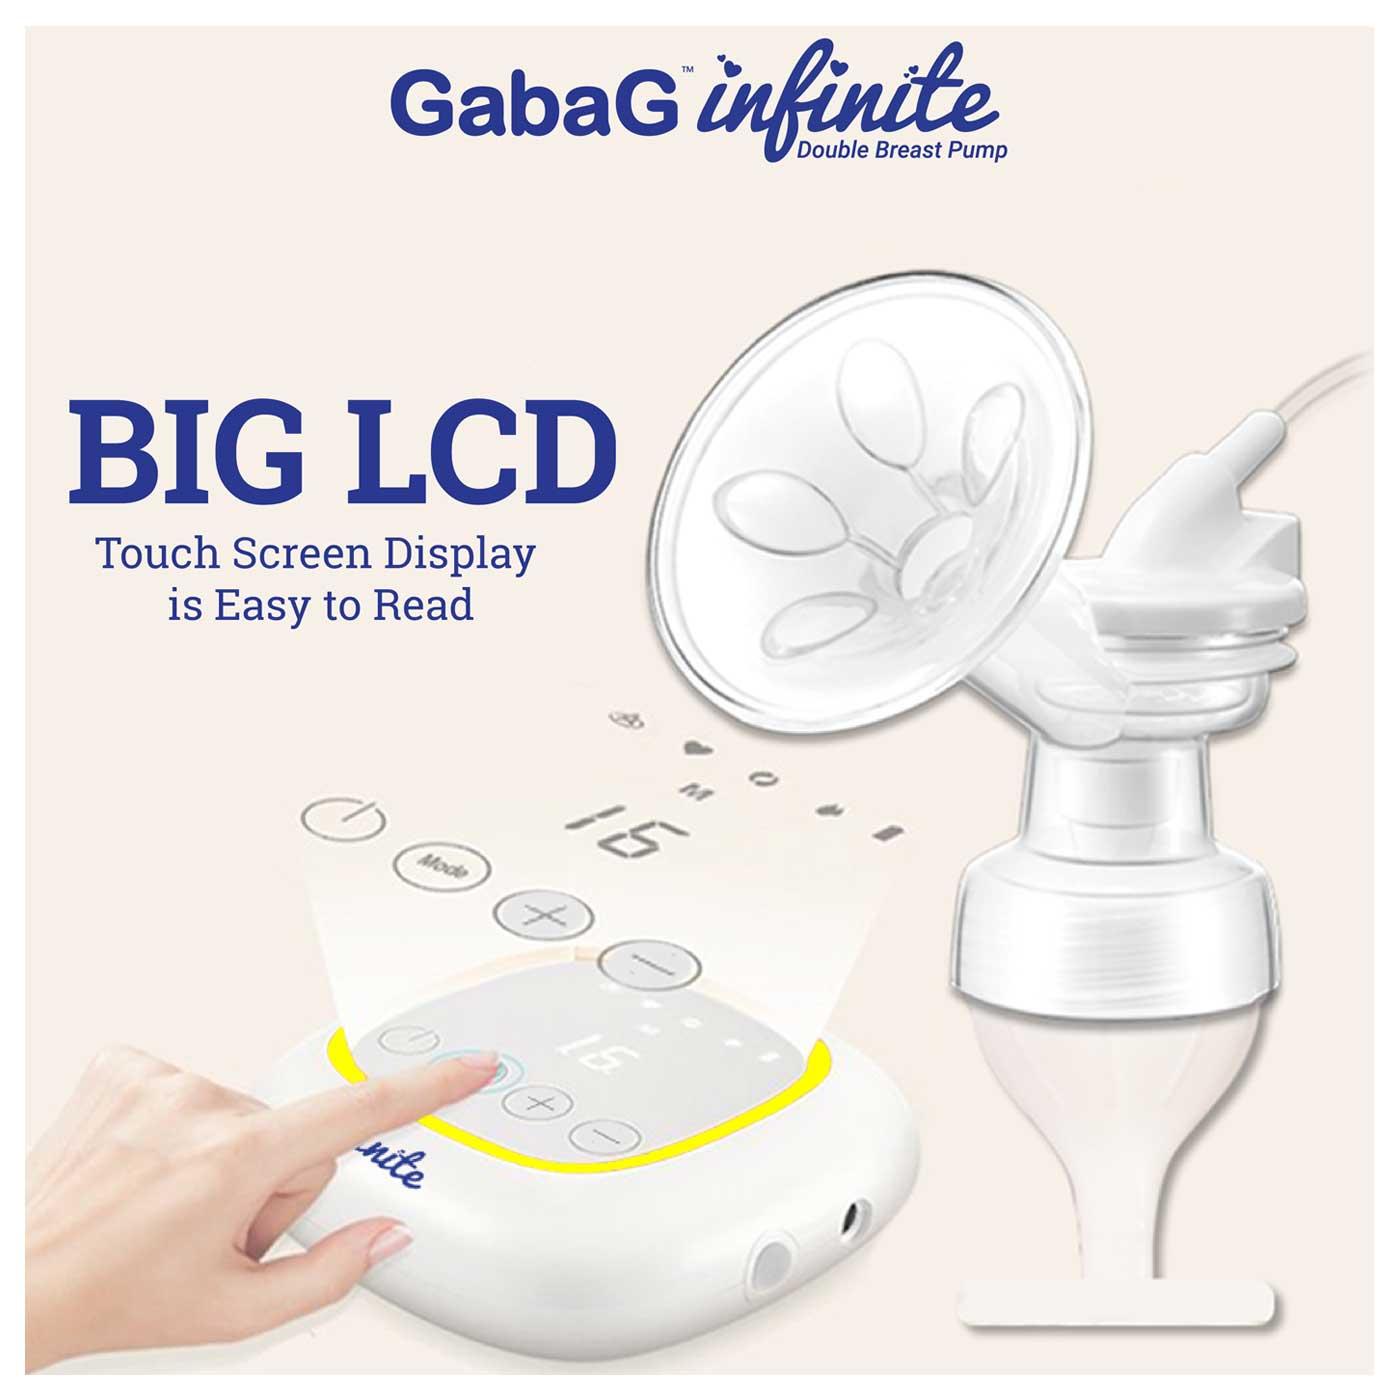 Gabag Infinite Double Breast Pump 5